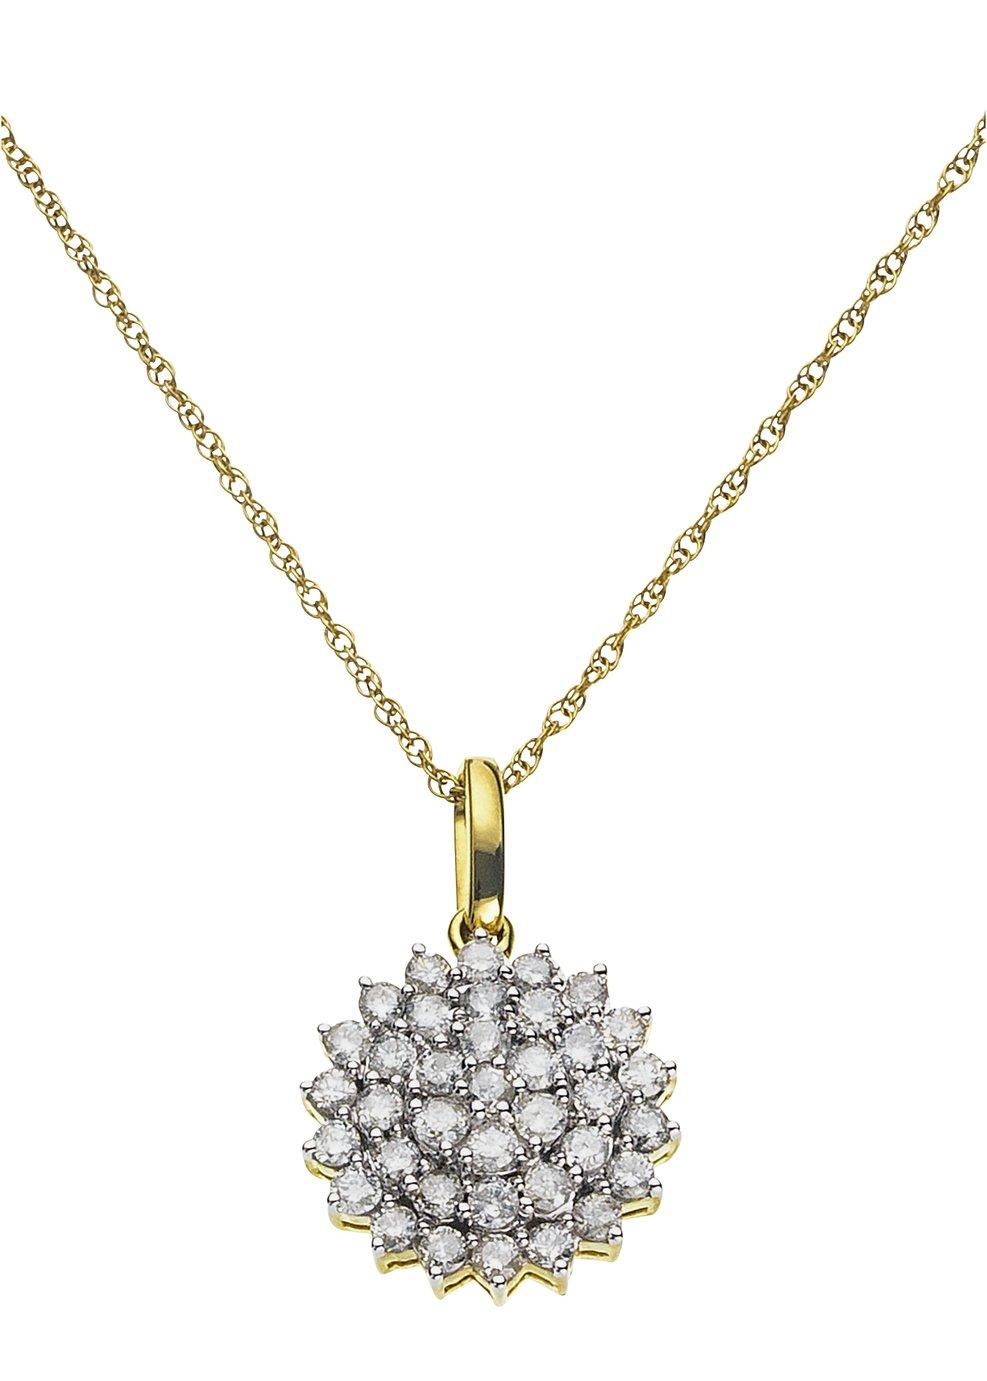 Image of Revere 9ct Gold 1.00ct tw Diamond Cluster Pendant